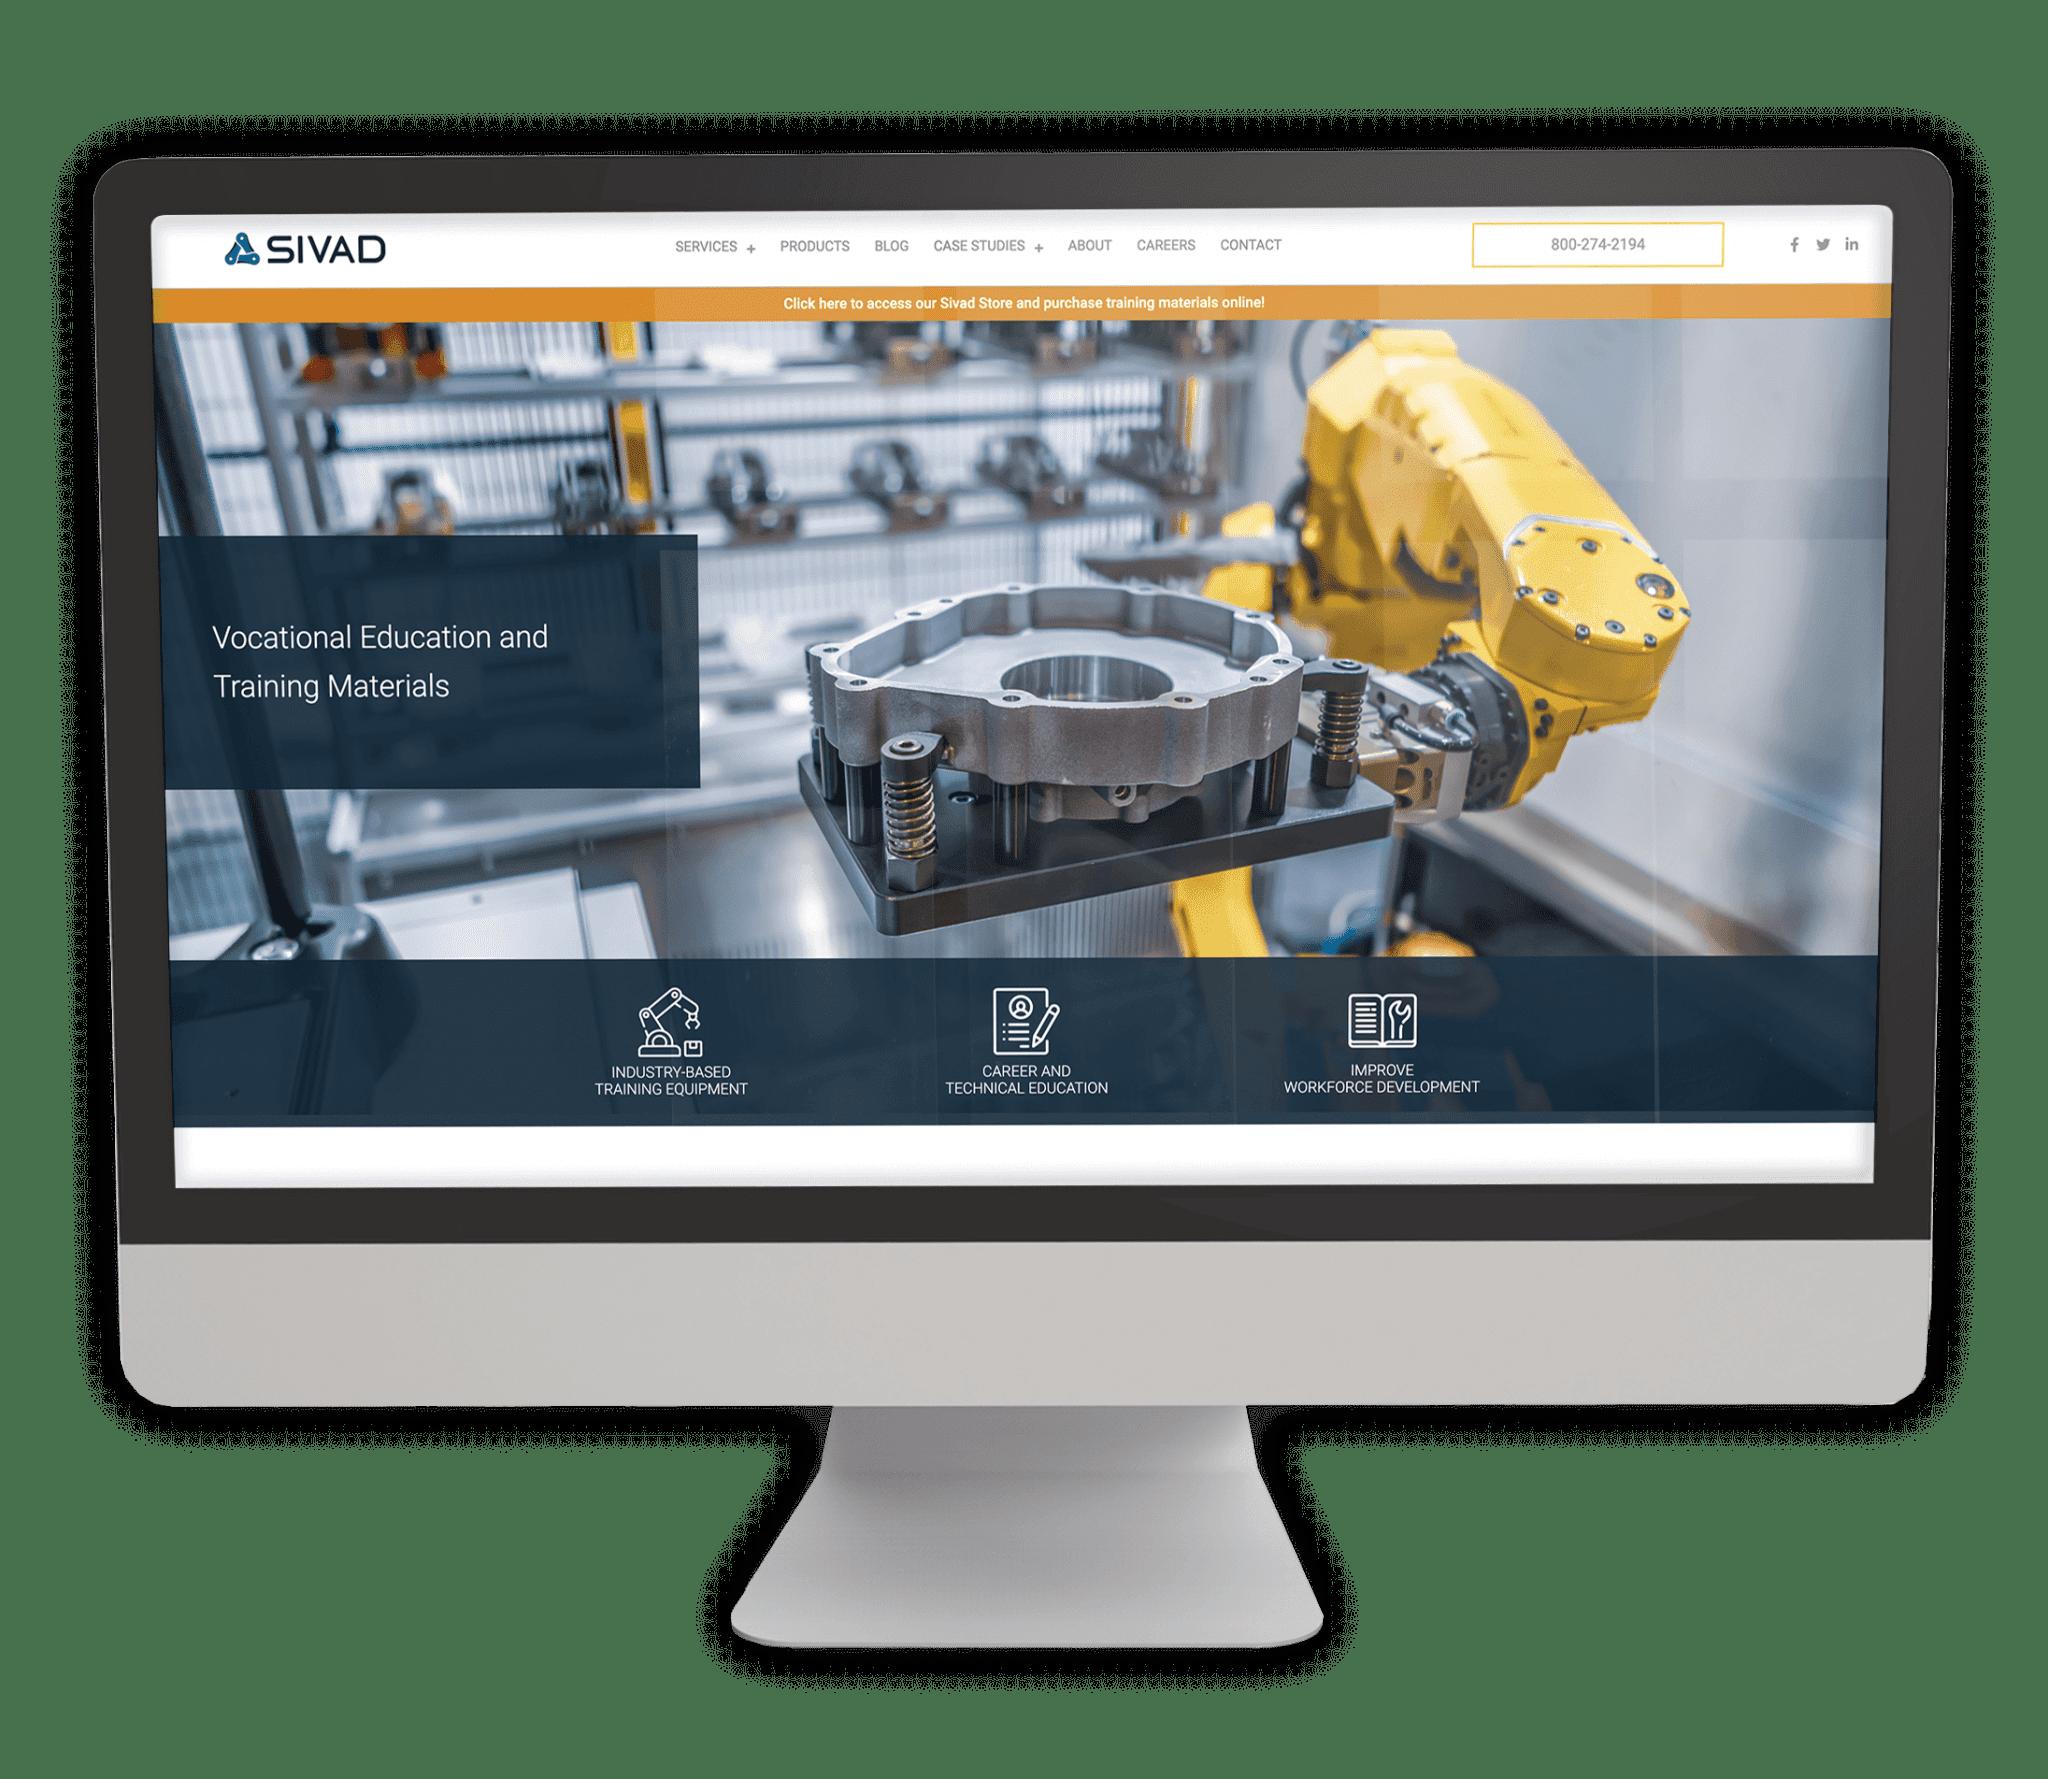 Example of Catapult web design company capabilities